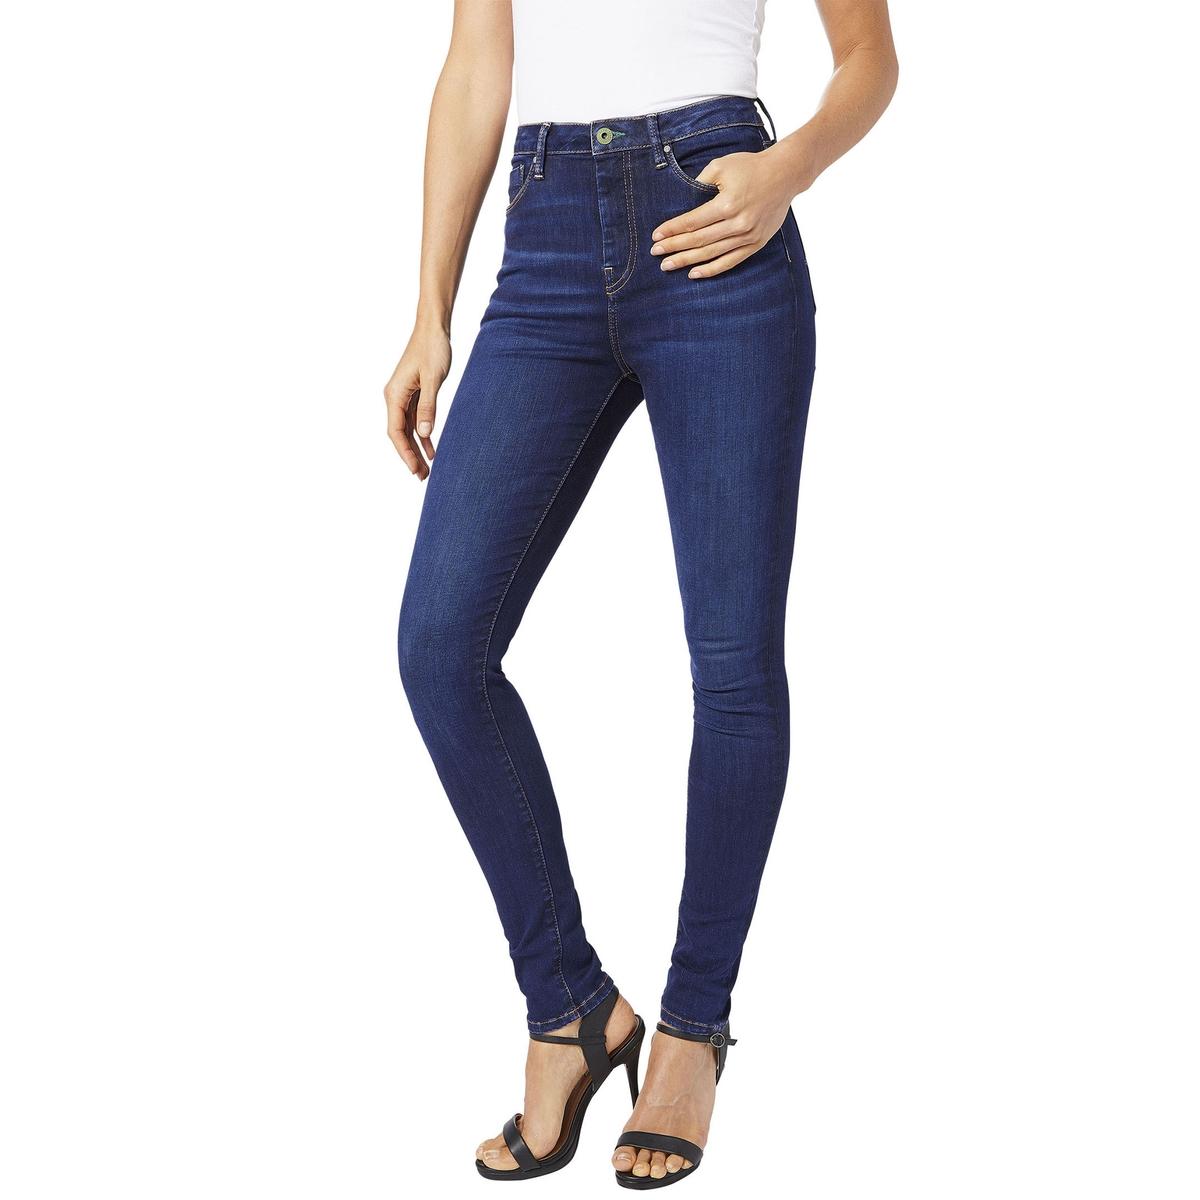 Джинсы DION скинни с завышенной талией bleached wash ripped jeans